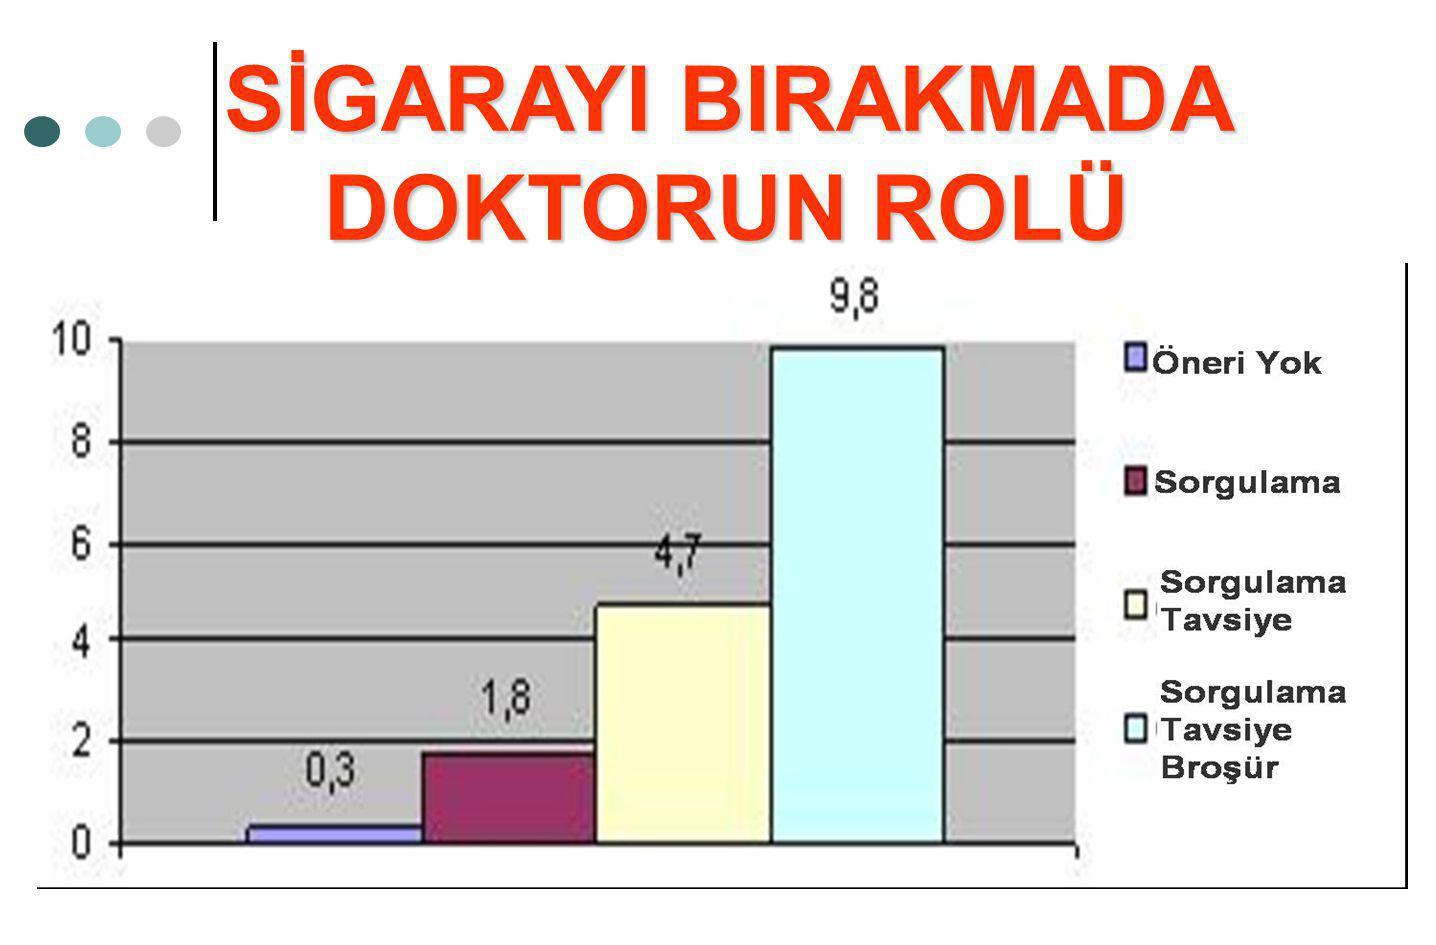 SİGARAYI BIRAKMADA DOKTORUN ROLÜ